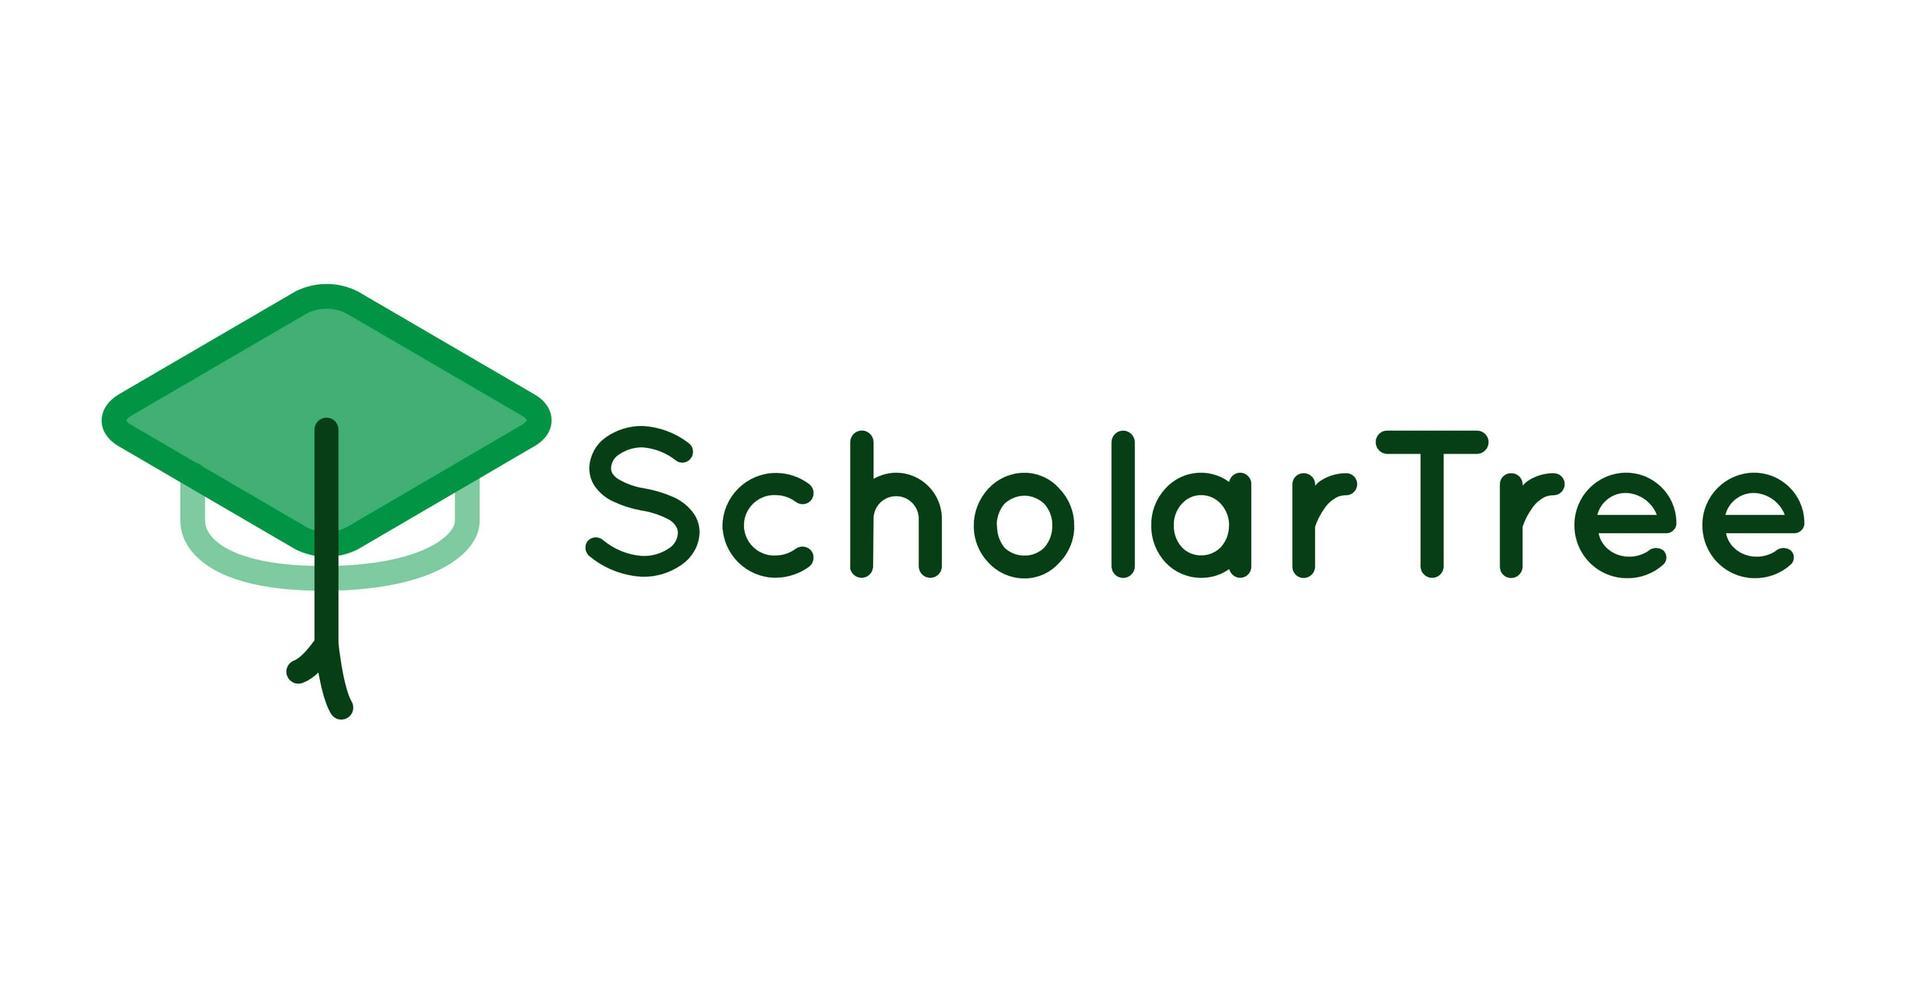 scholar tree